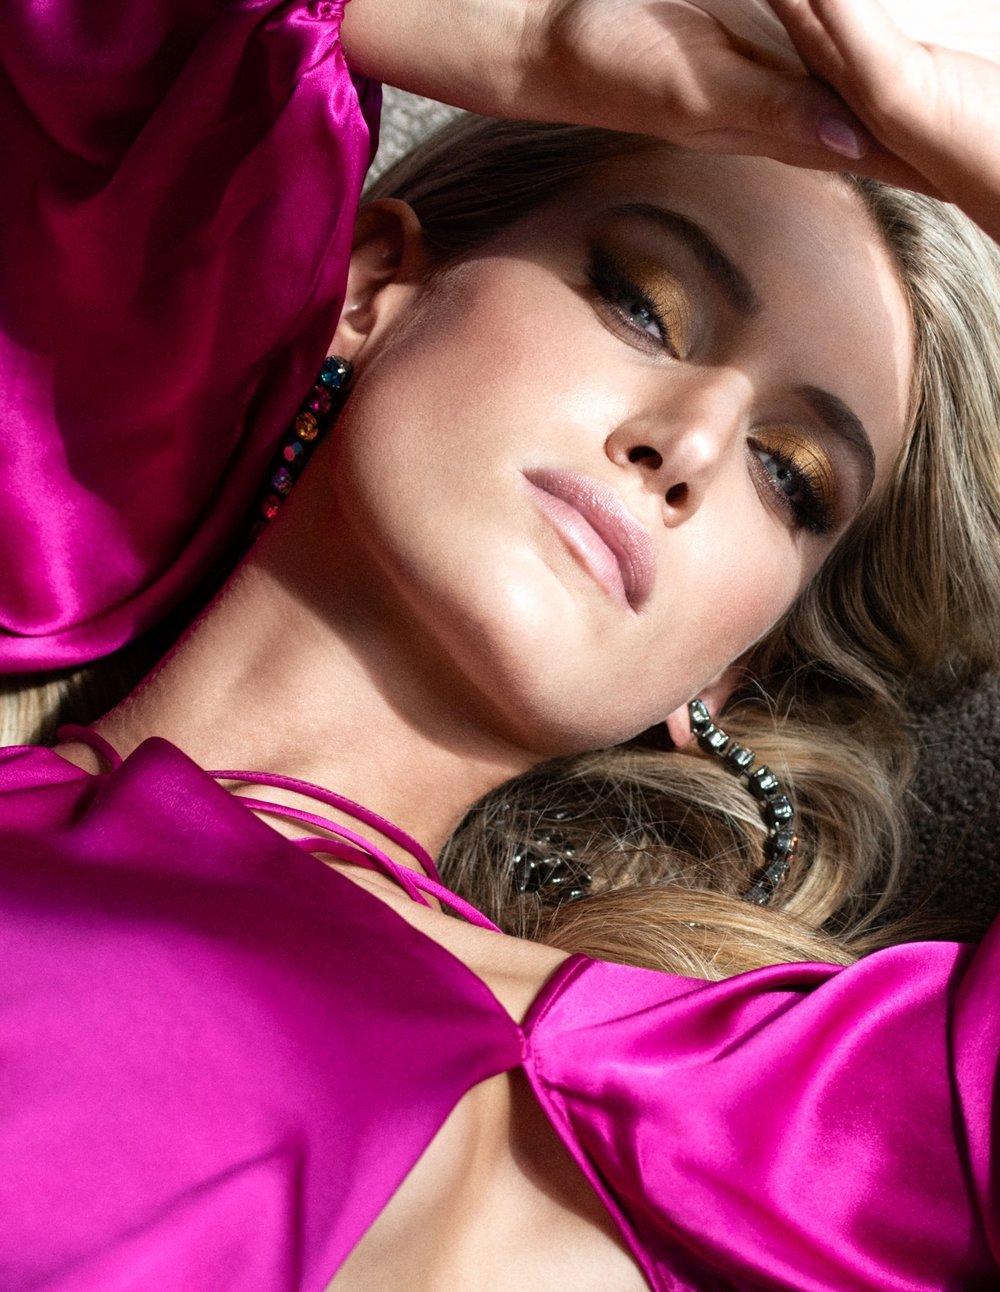 Caroline. - A few snaps with quick-witted model and actress, Caroline Lowe @carolinelowe IMG Models , Photographs: Dave Blake @daveblakephoto. Hair-Makeup: Simone Forte. Styling: Natalia de Martin. Location: Sydney, Australia